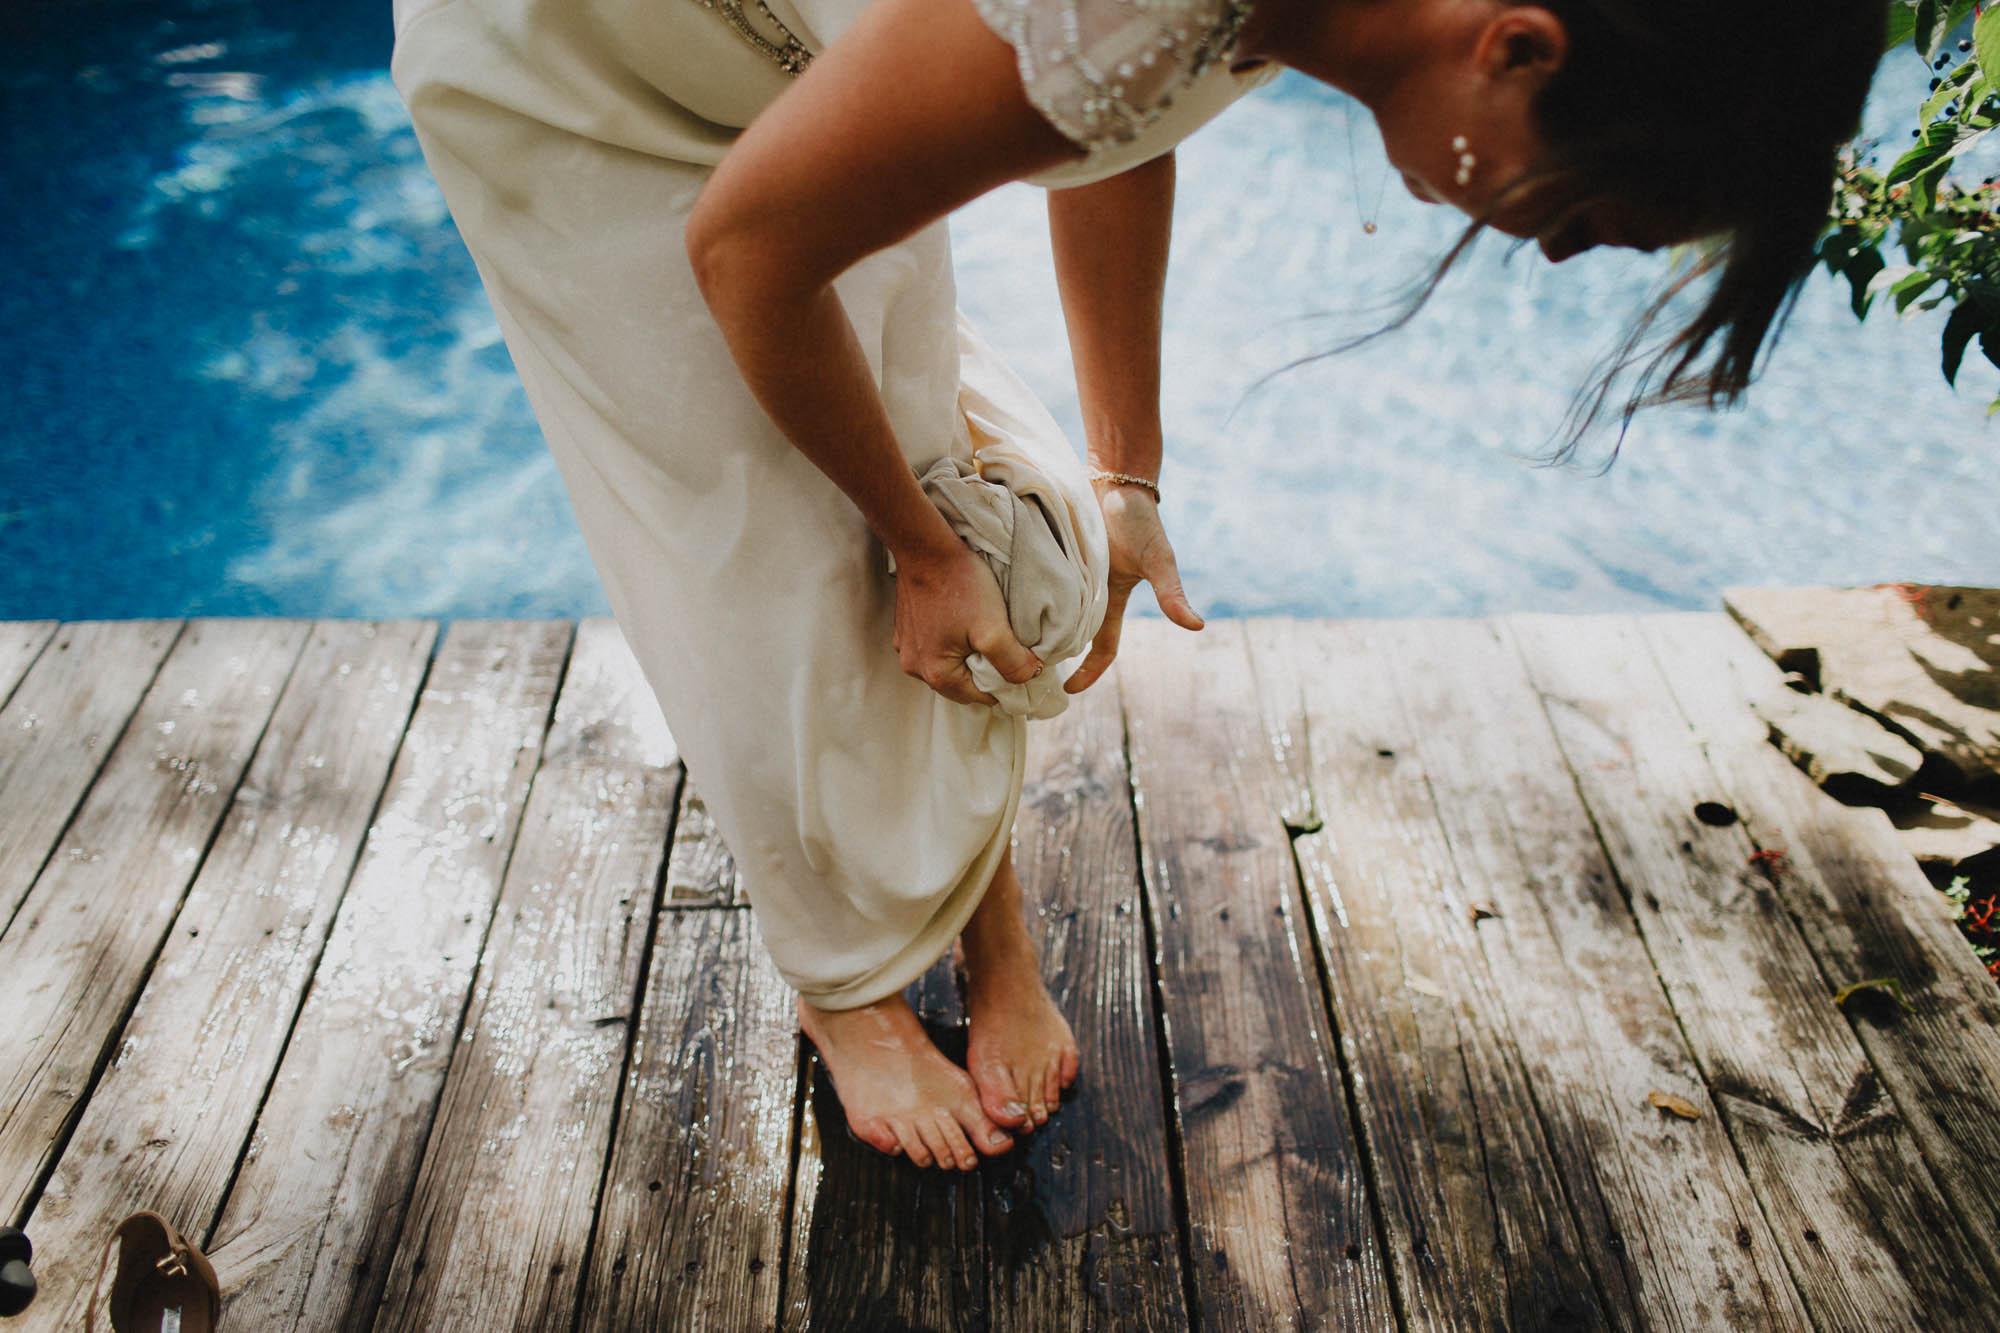 Leah-Graham-Michigan-Outdoor-DIY-Wedding-095@2x.jpg